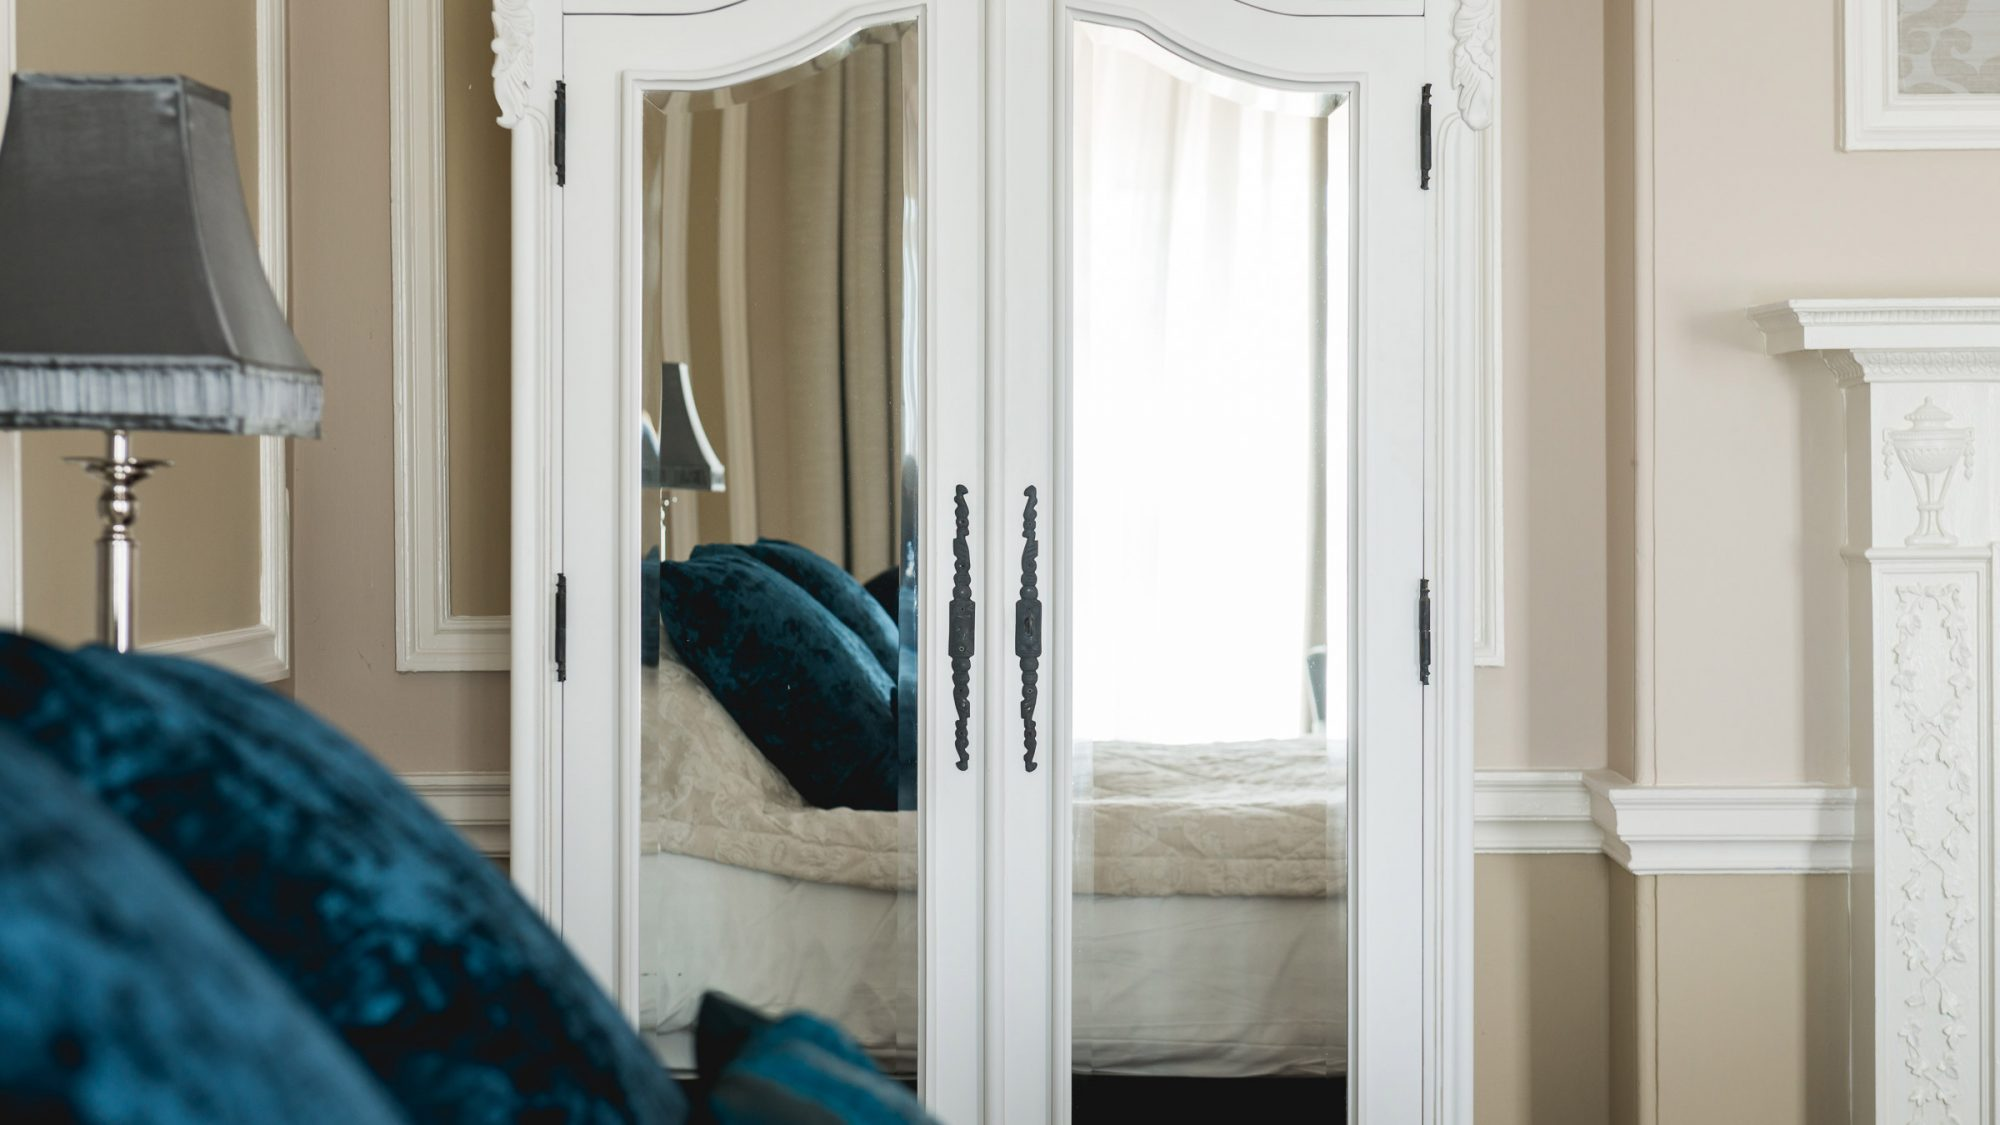 Hothorpe Hall guest bedroom interior